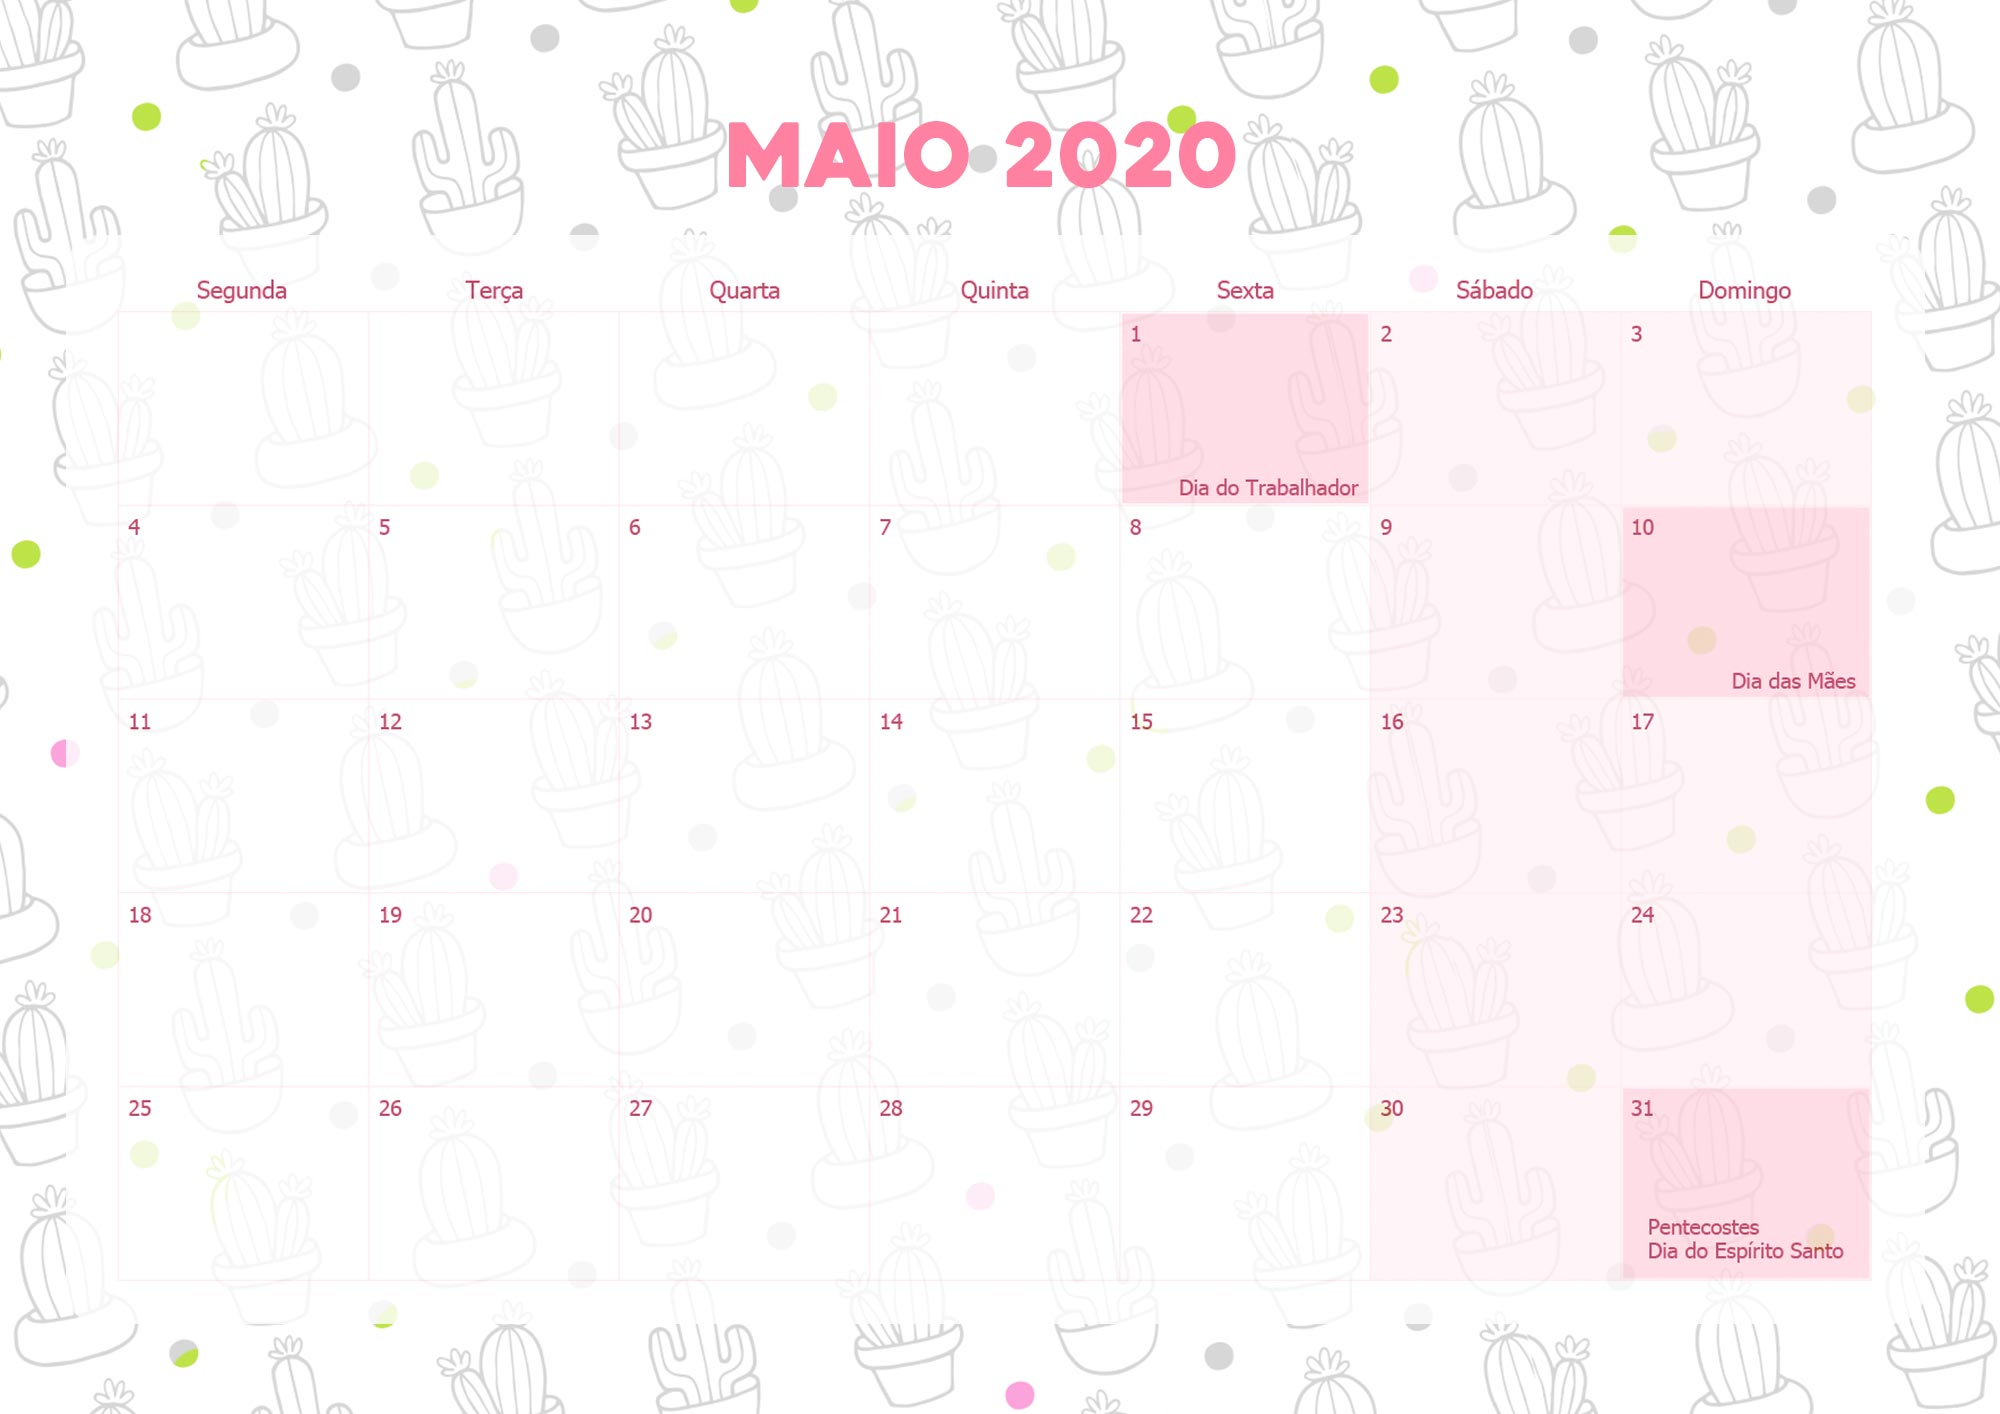 Calendario Mensal Lhama Drama 2020 Maio